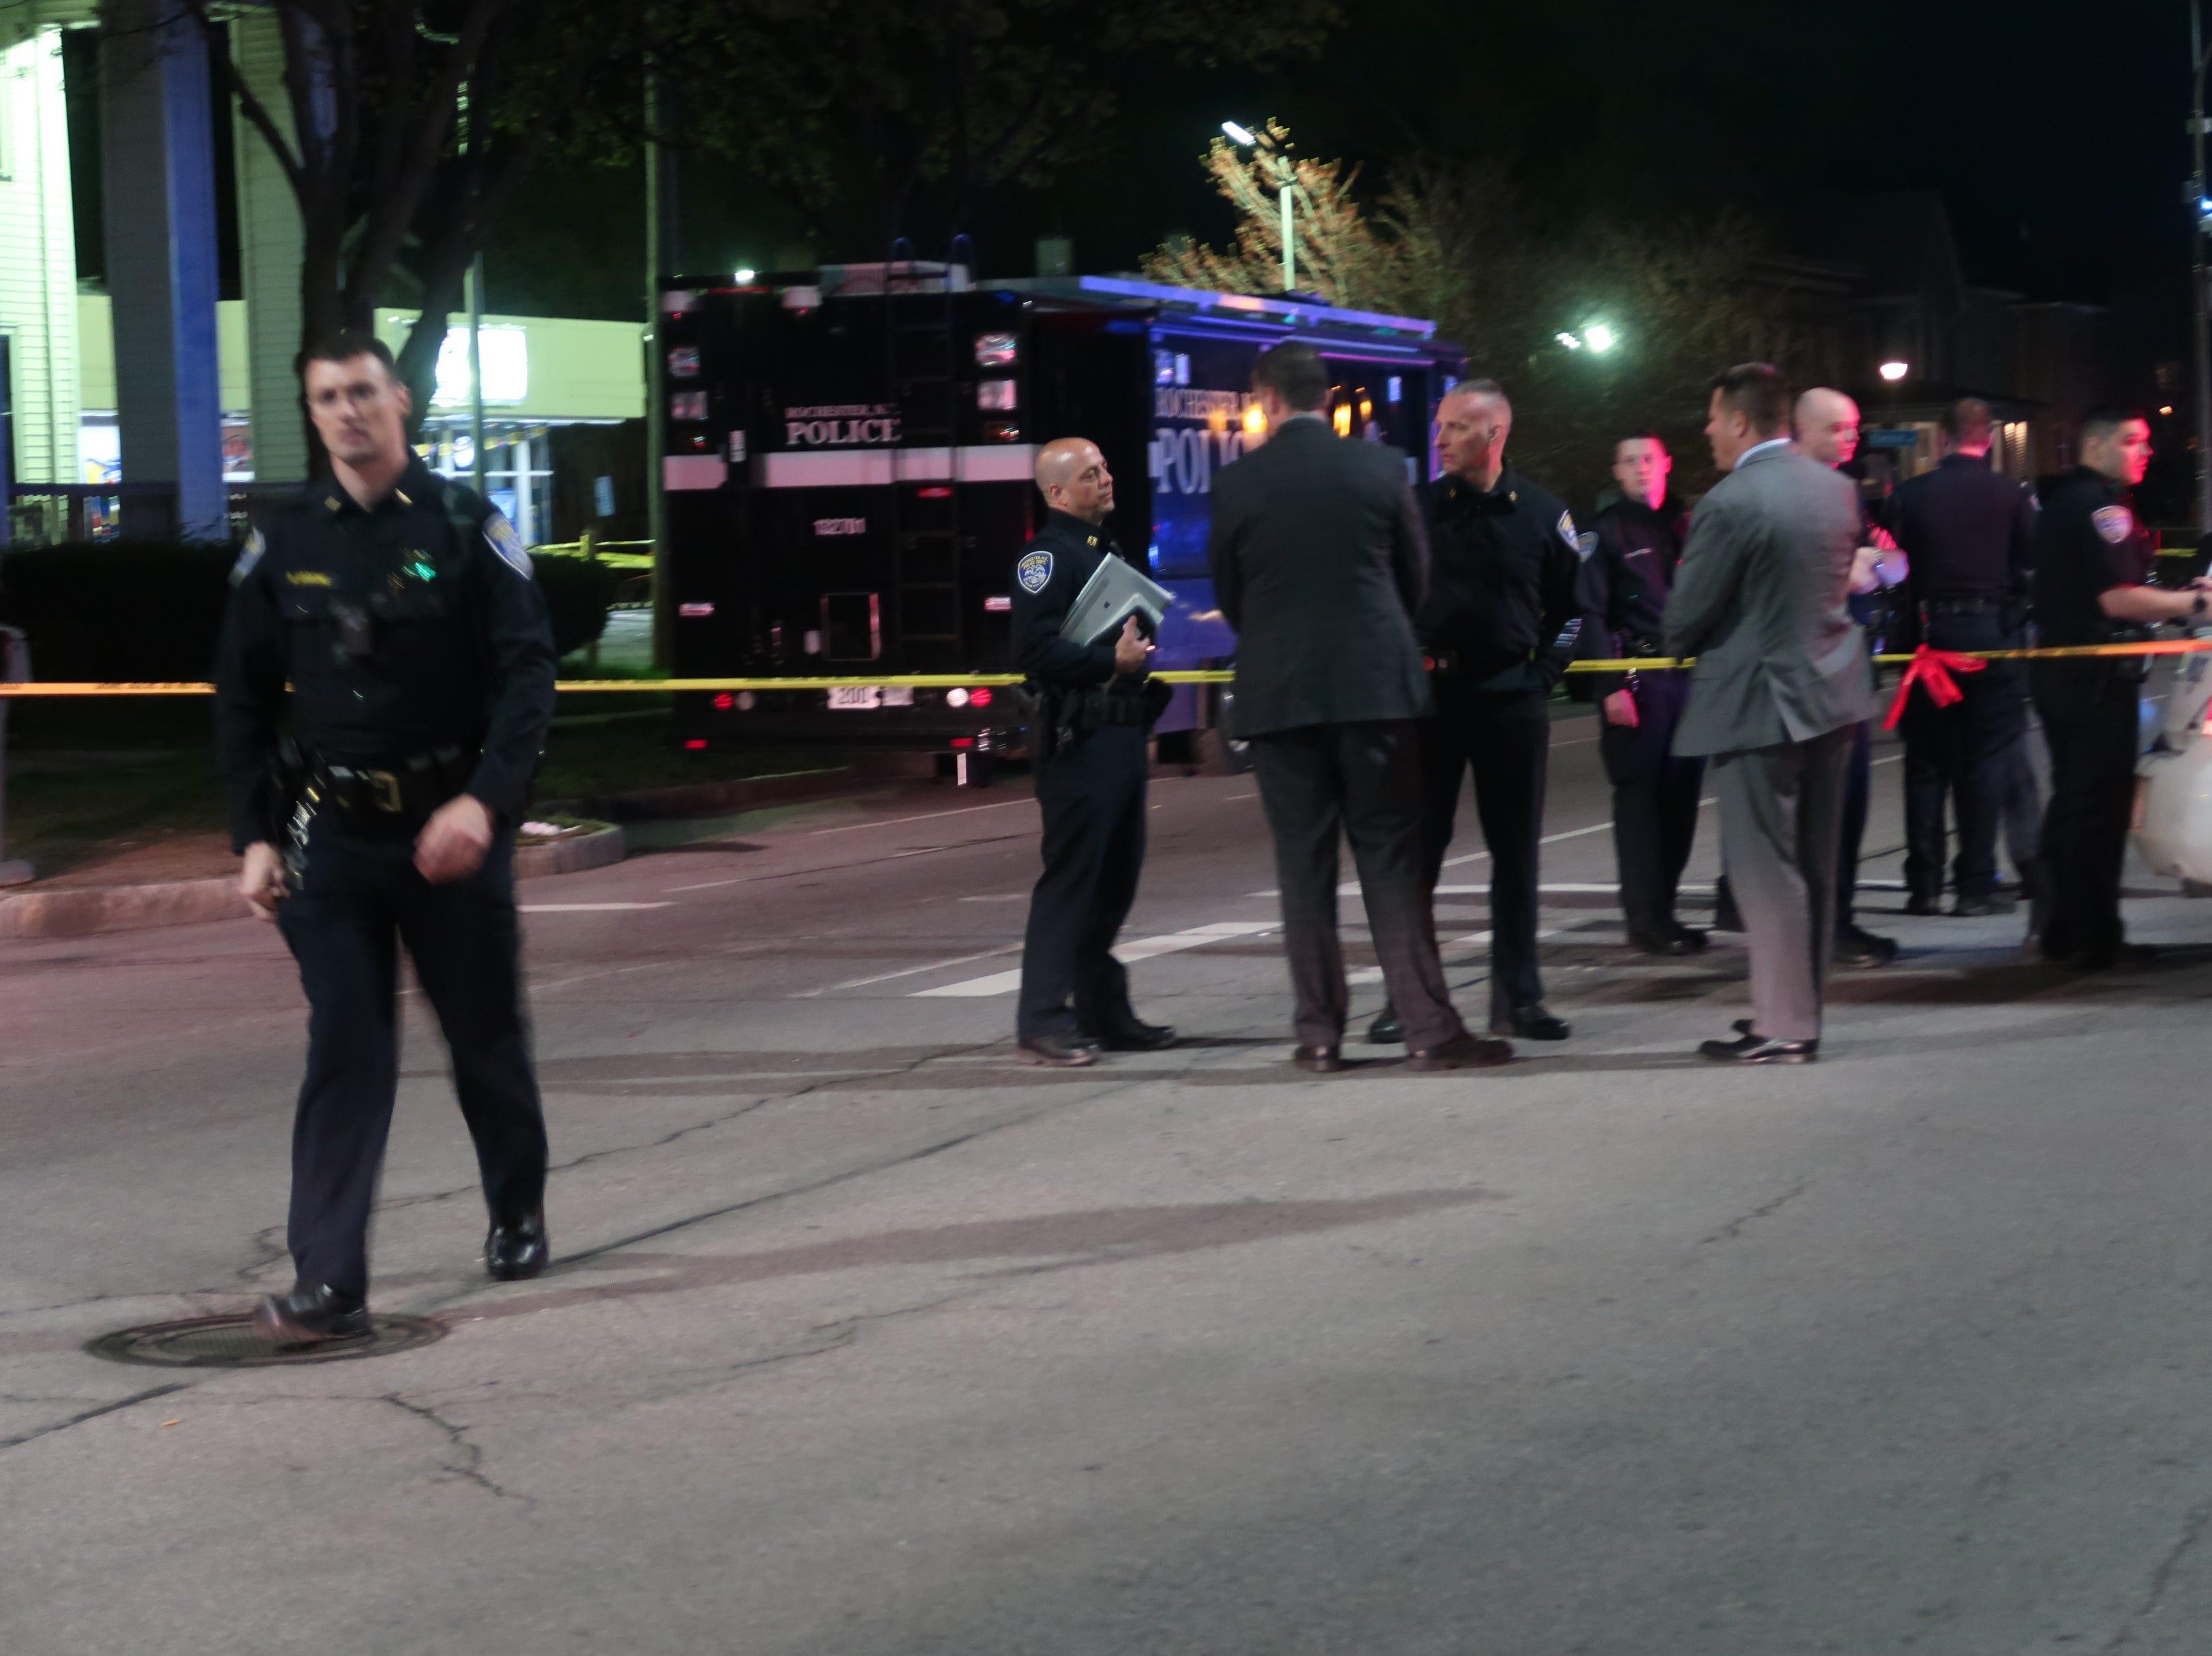 Lt. Brian Marone, left, walks away from the crime scene late Saturday night on Dewey Avenue.